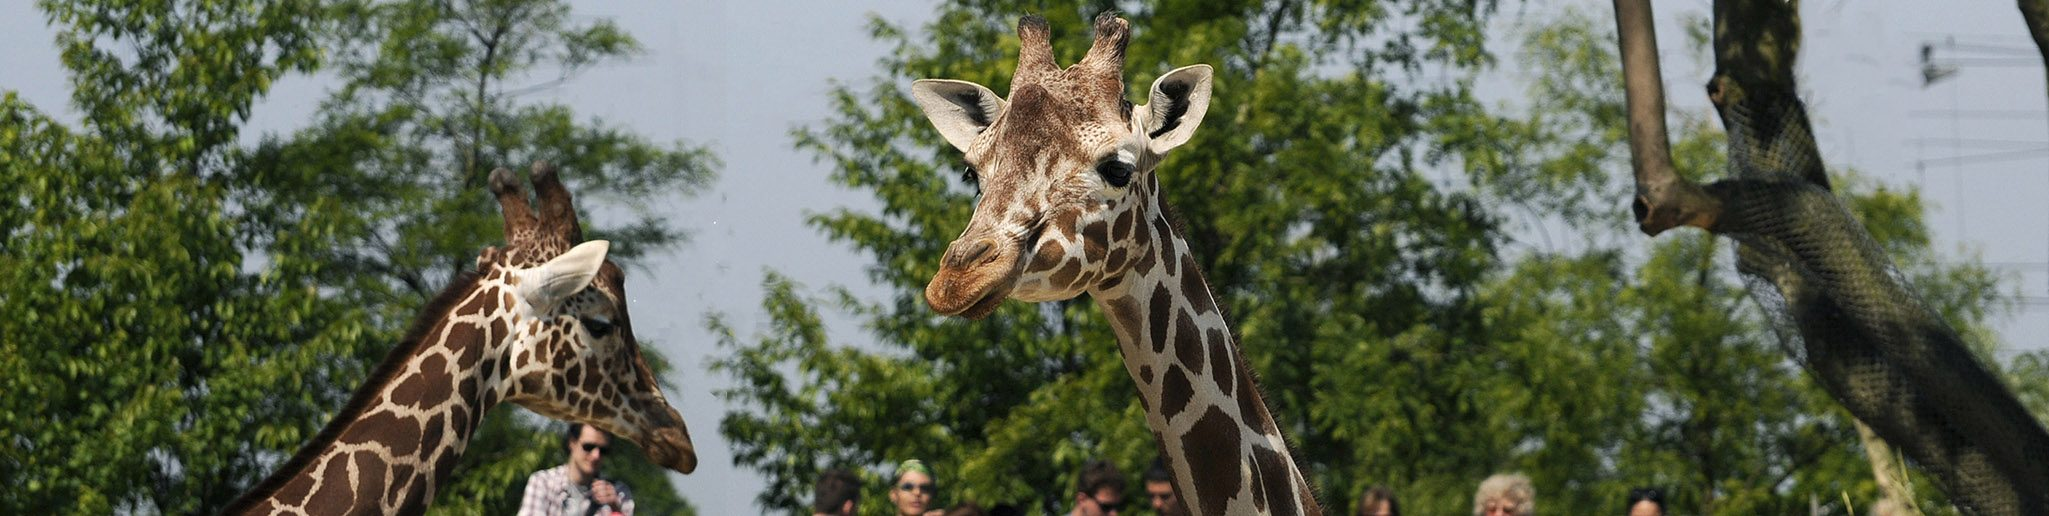 giraf kijkt in lens